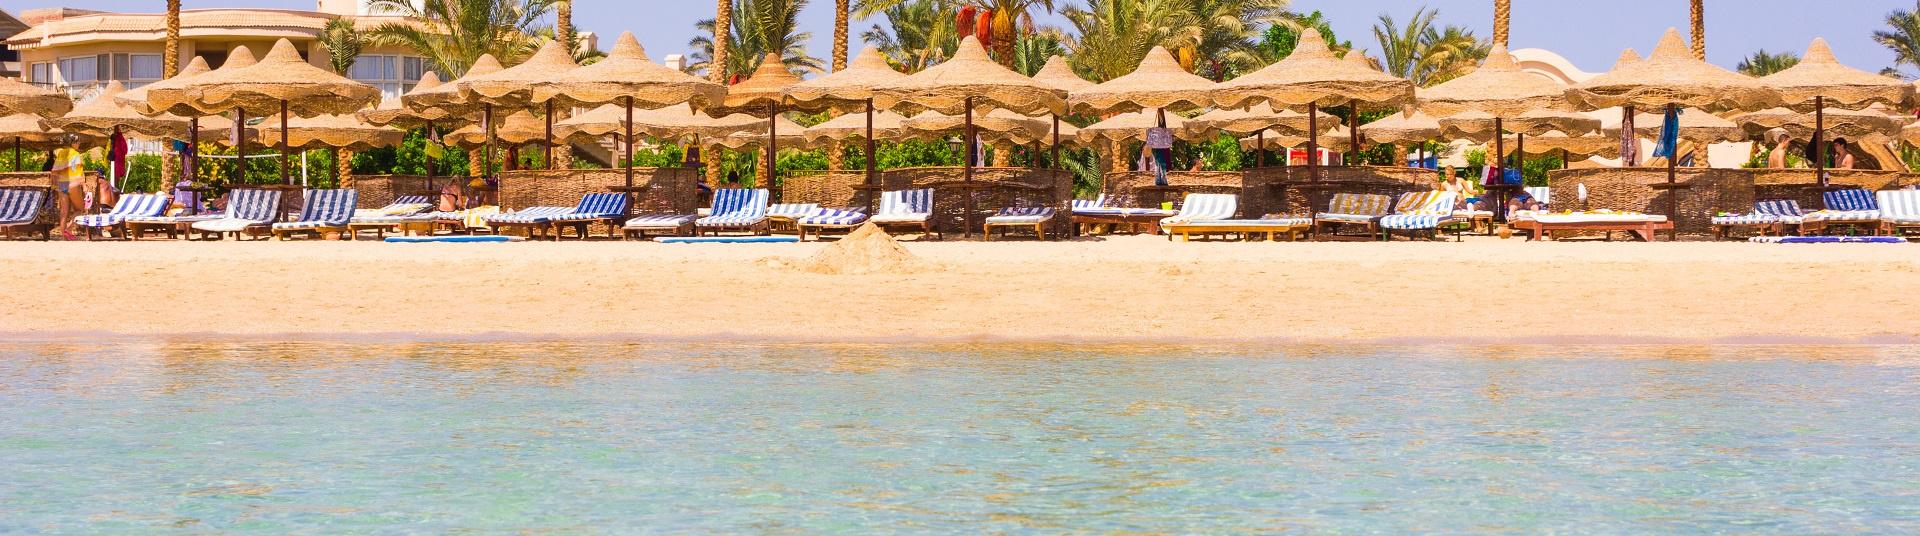 Week-end pas cher Hurghada